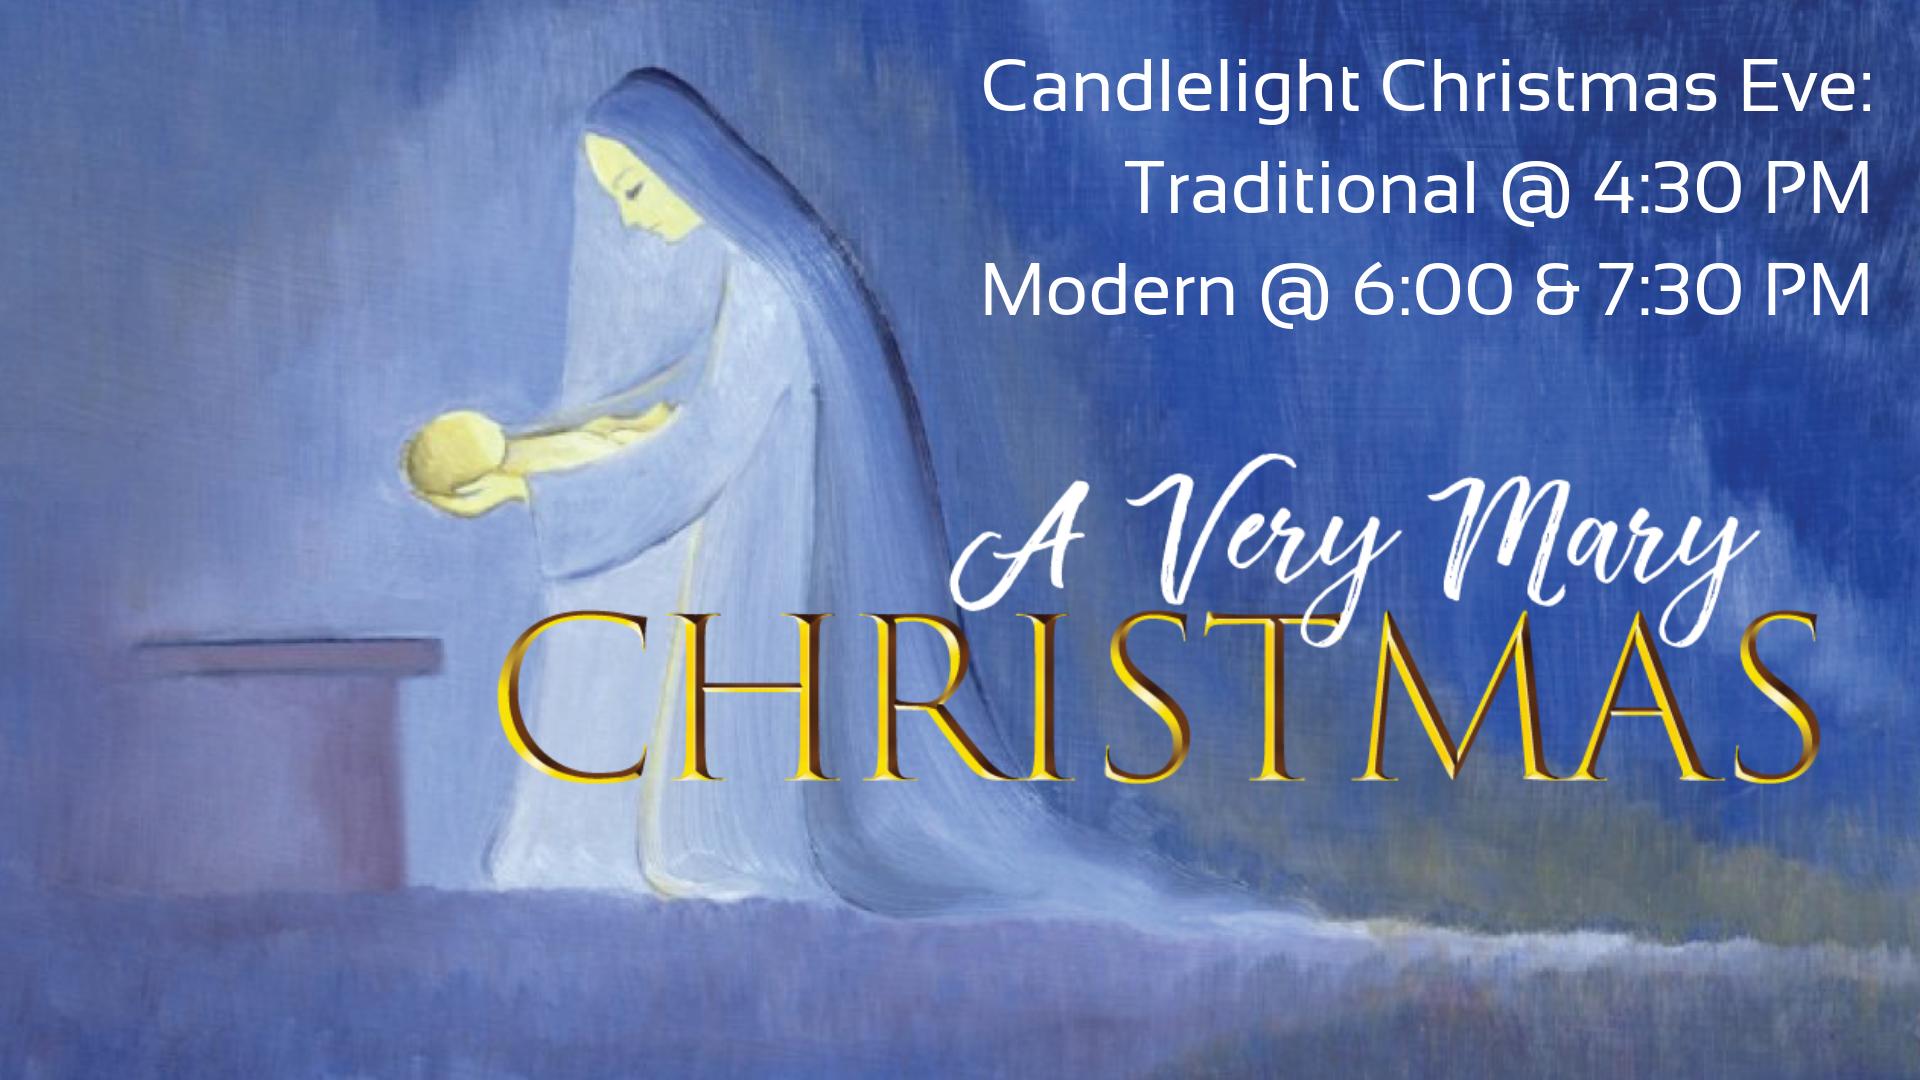 Candlelight Christmas Eve.png